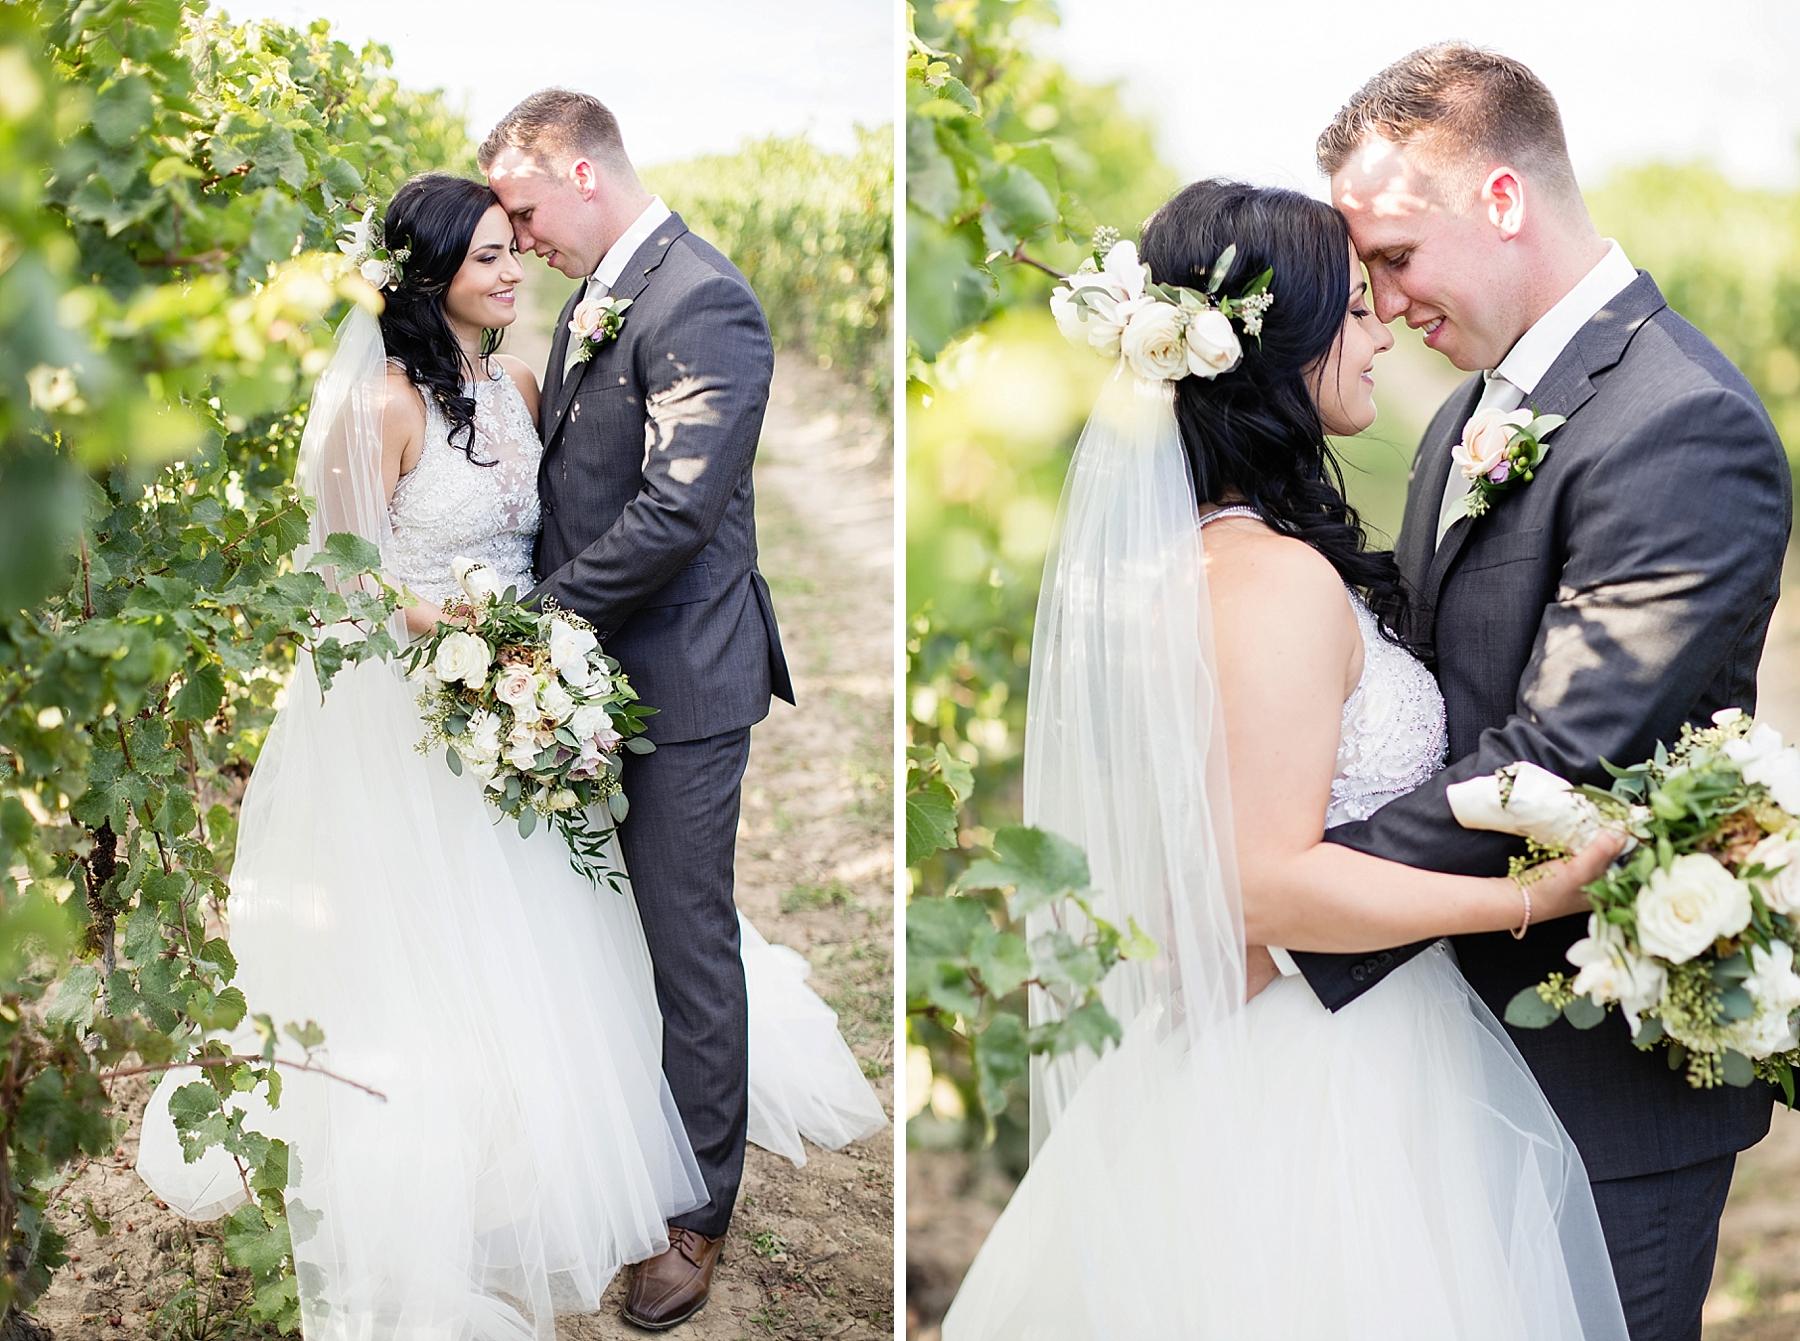 windsor-wedding-photographer-sprucewood-shores-winery-wedding-niagara-on-the-lake-wedding-photographer-eryn-shea-photography_0040.jpg